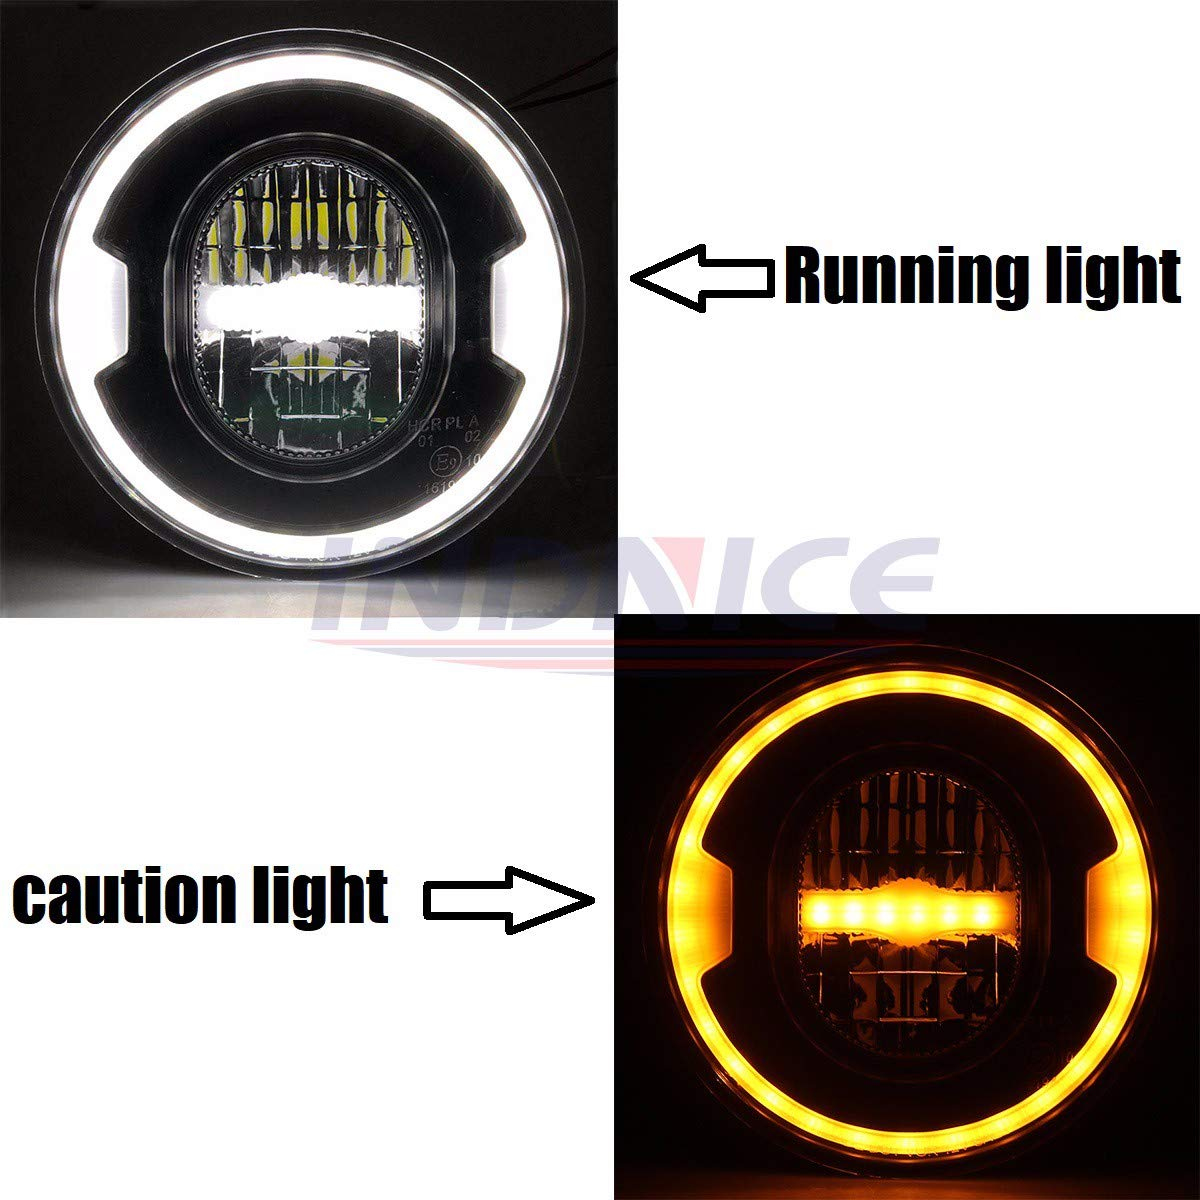 2018 newest headlight 7 inch round led headlight with angle eye for harley FLHTCU motorcycle softail headlights Black B07HL7S1G1